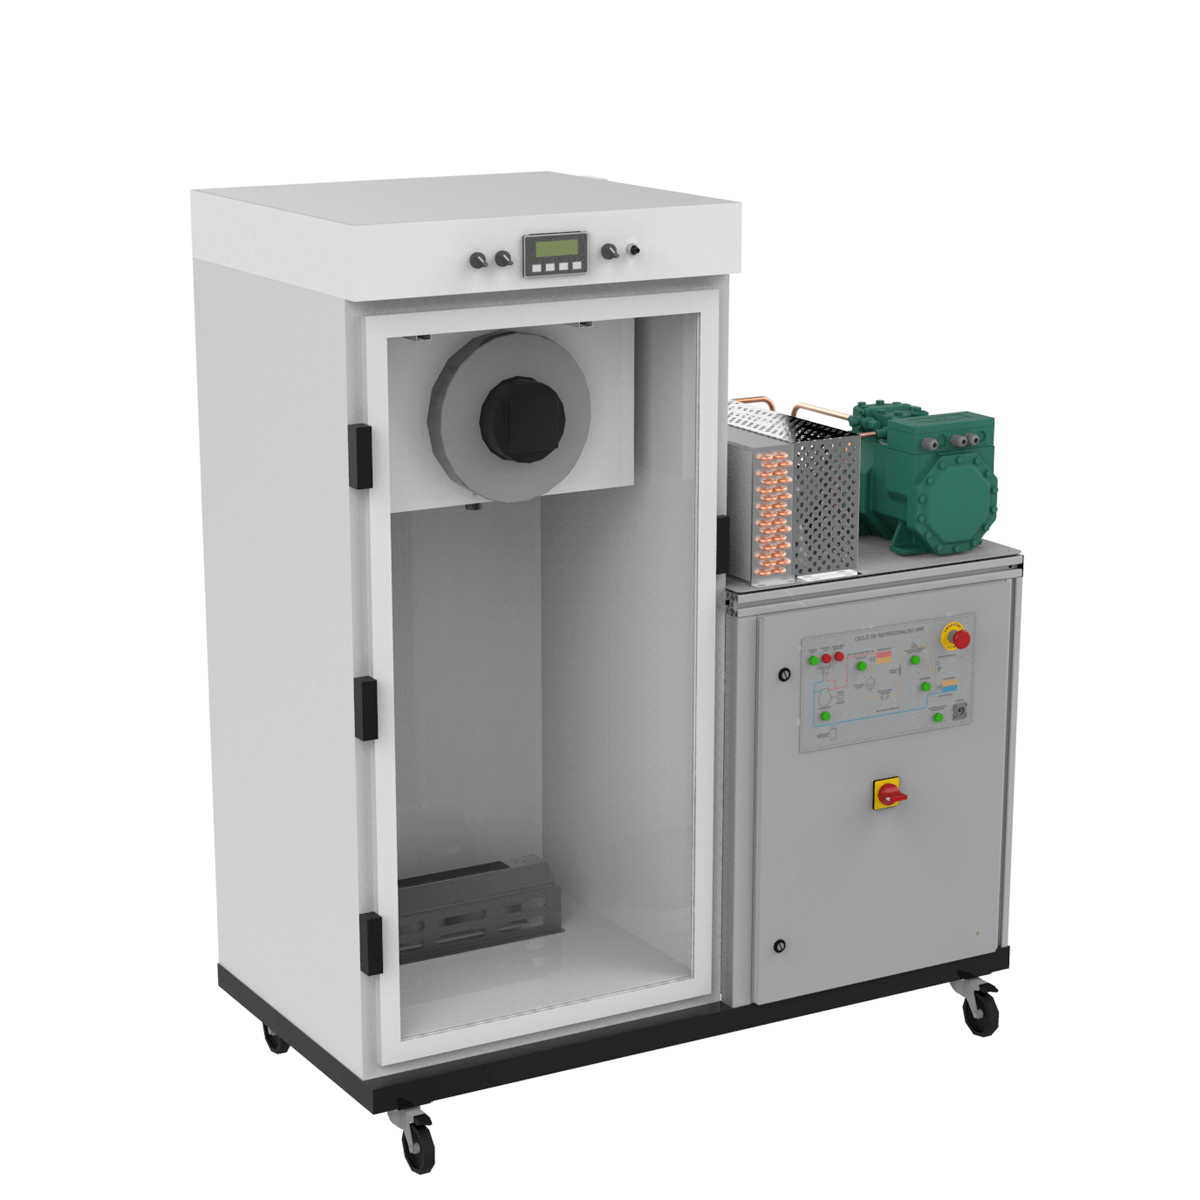 lab-de-refrigeracao-industrial-bancada-didatica-refrigeracao-svrf-auttom-2